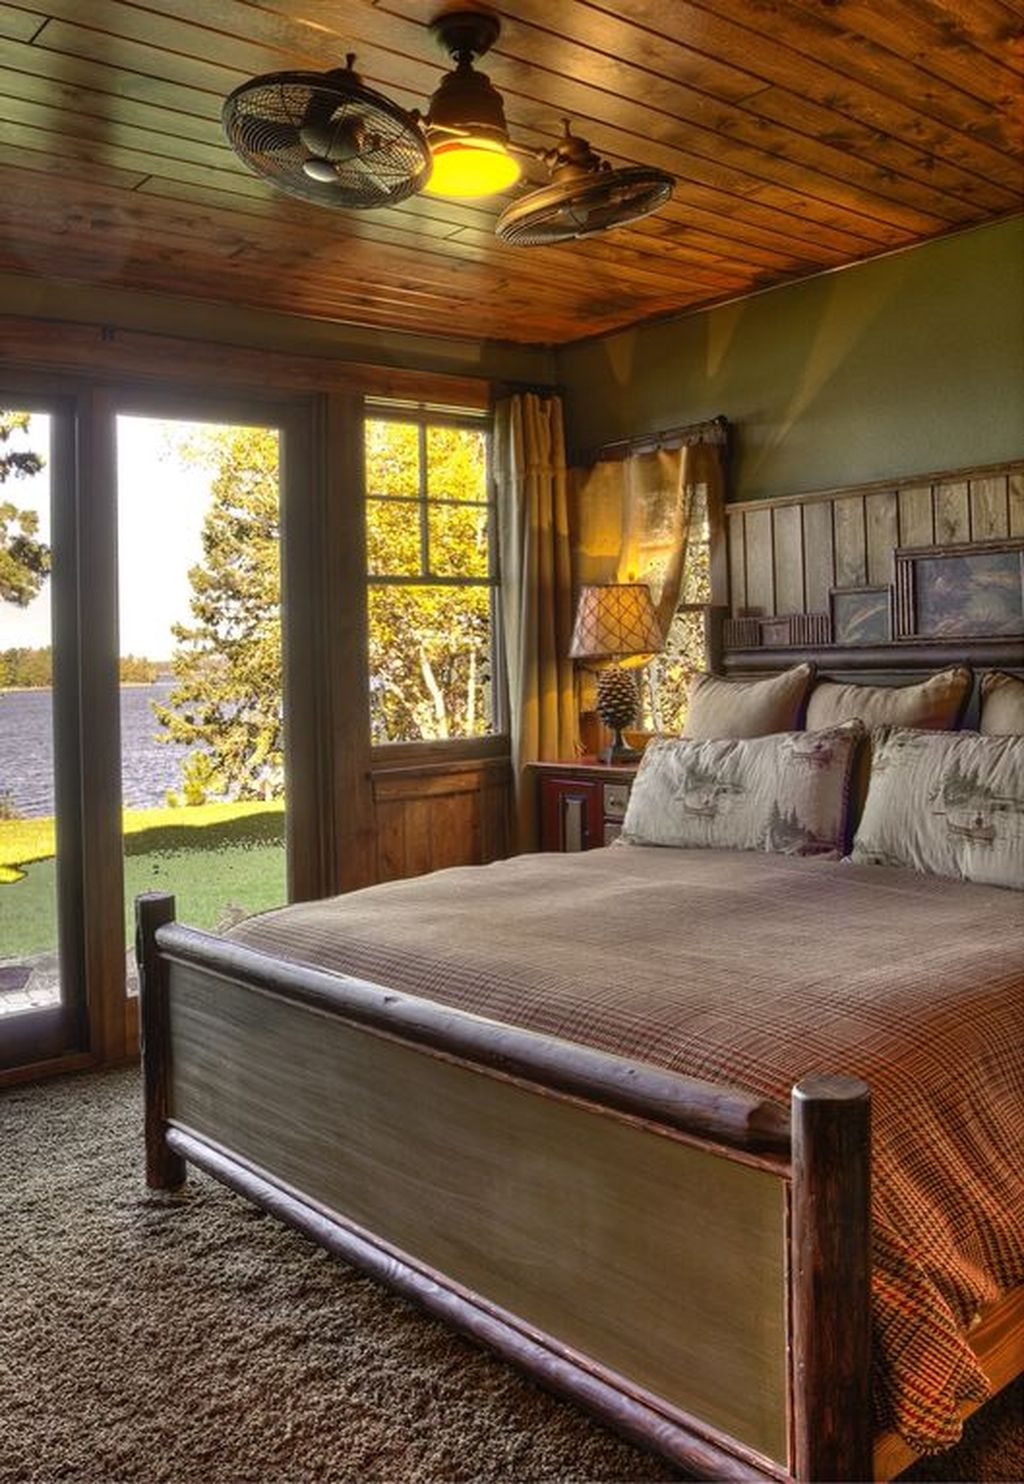 Gorgeous vintage master bedroom decoration ideas 57 for Vintage master bedroom decorating ideas